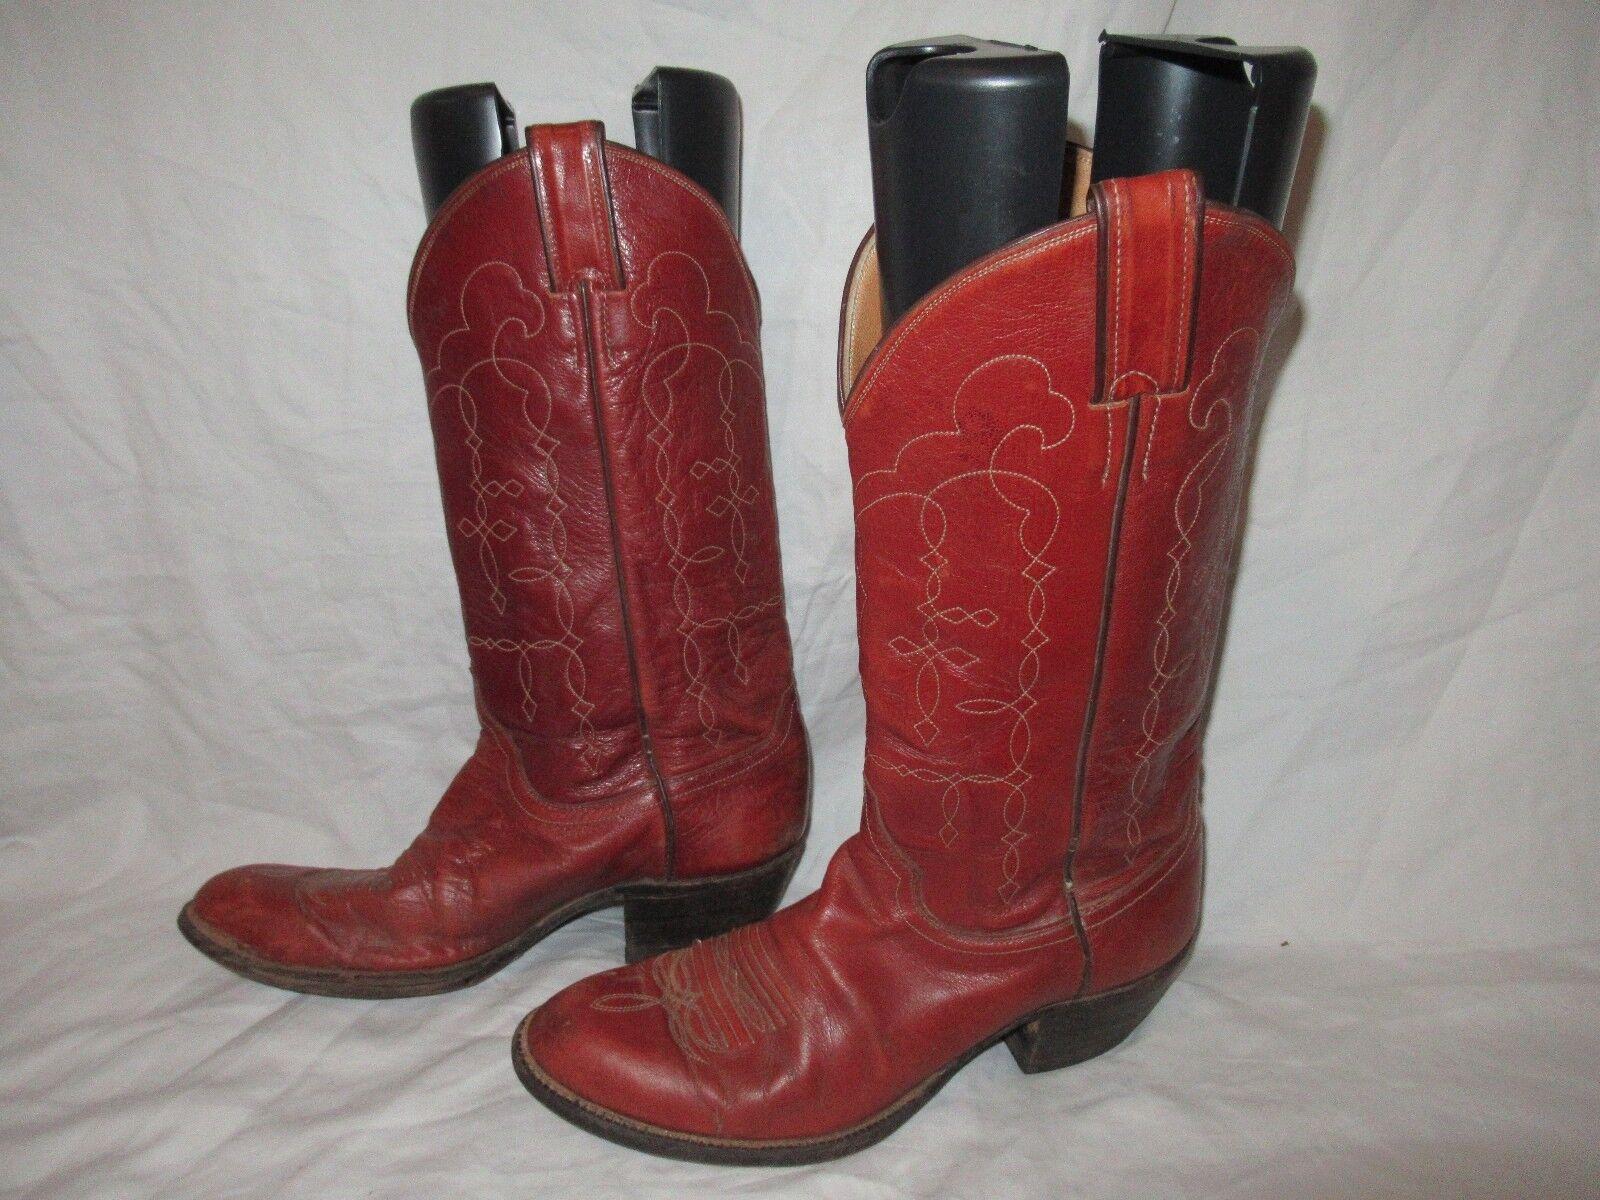 JUSTIN USA Made MENS MENS MENS Größe 8 braun Leather WESTERN COWBOY Stiefel MAKE OFFER a3979f